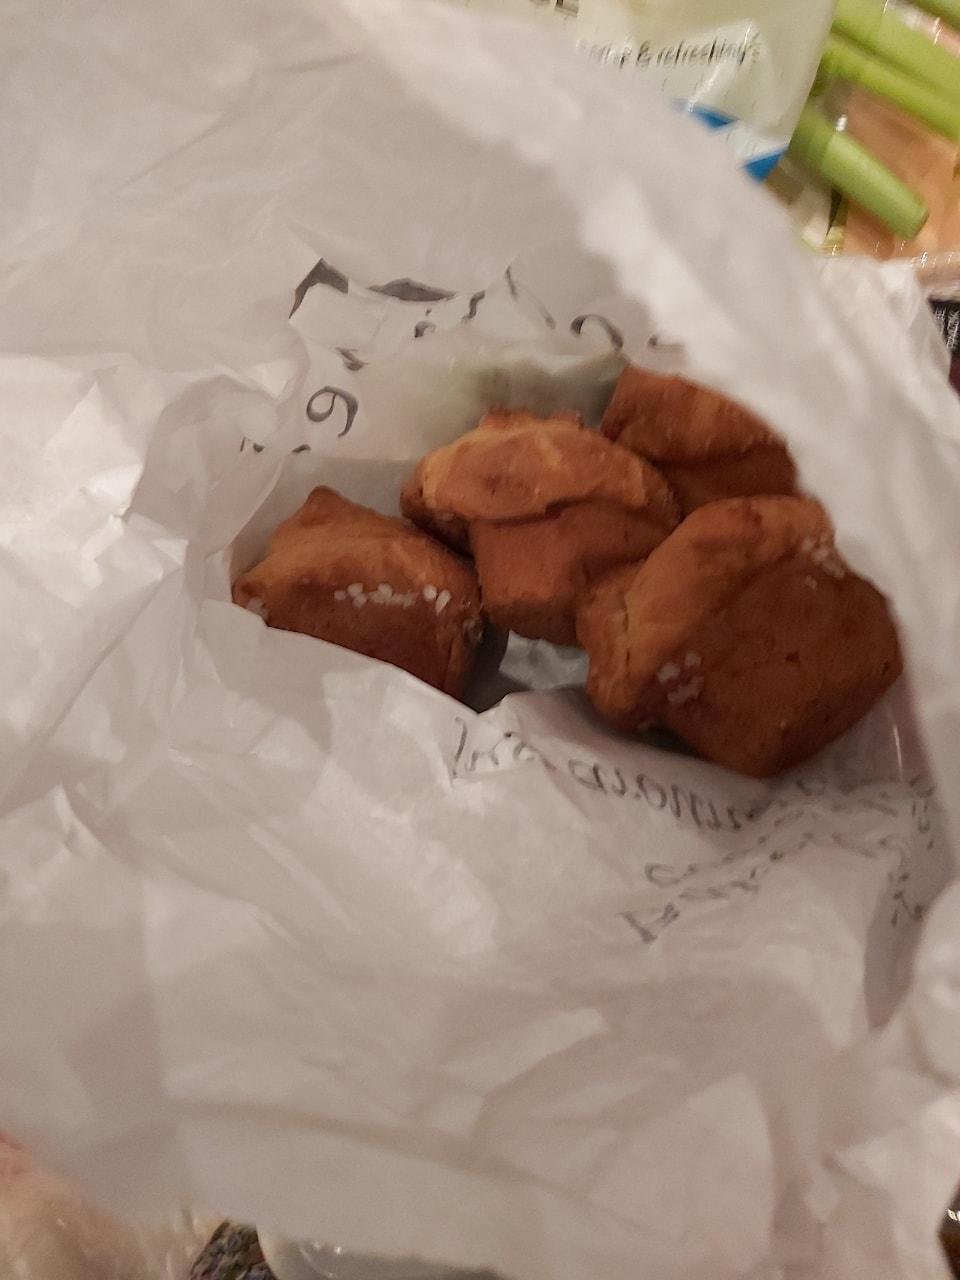 4 sugar topped muffins Soderberg